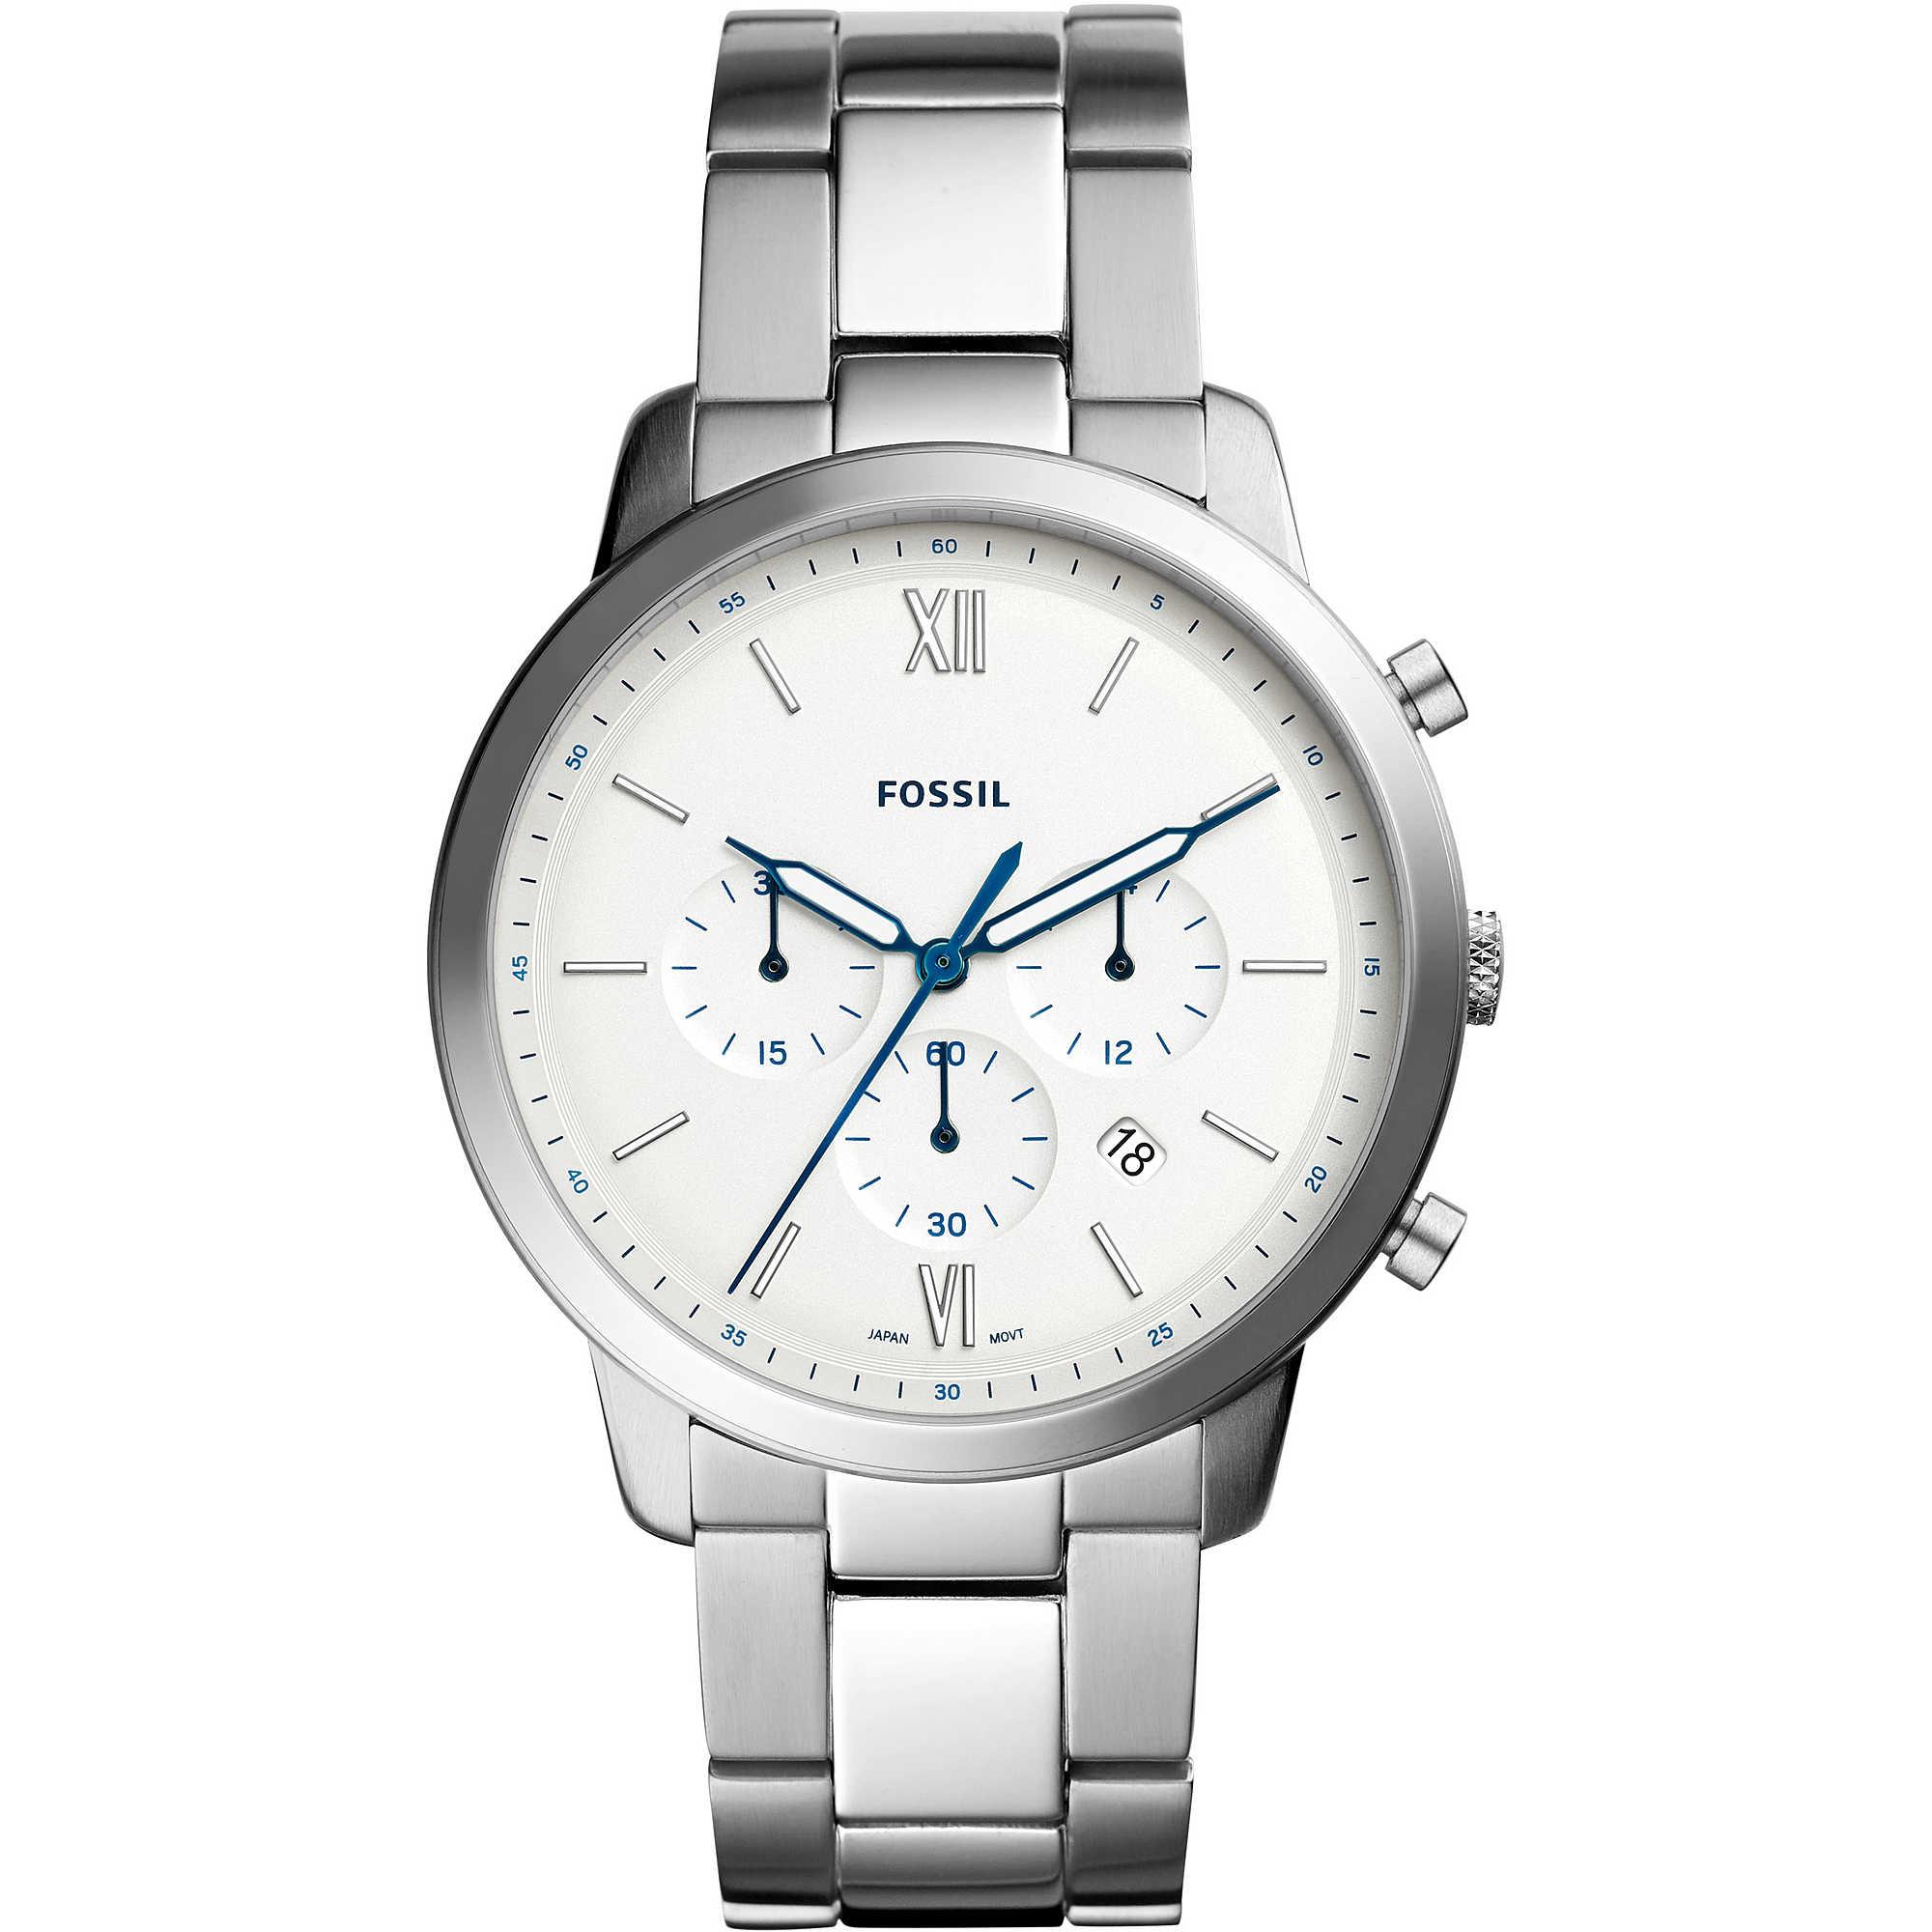 ddbdd04105 orologio cronografo uomo Fossil Neutra Chrono FS5433 cronografi Fossil